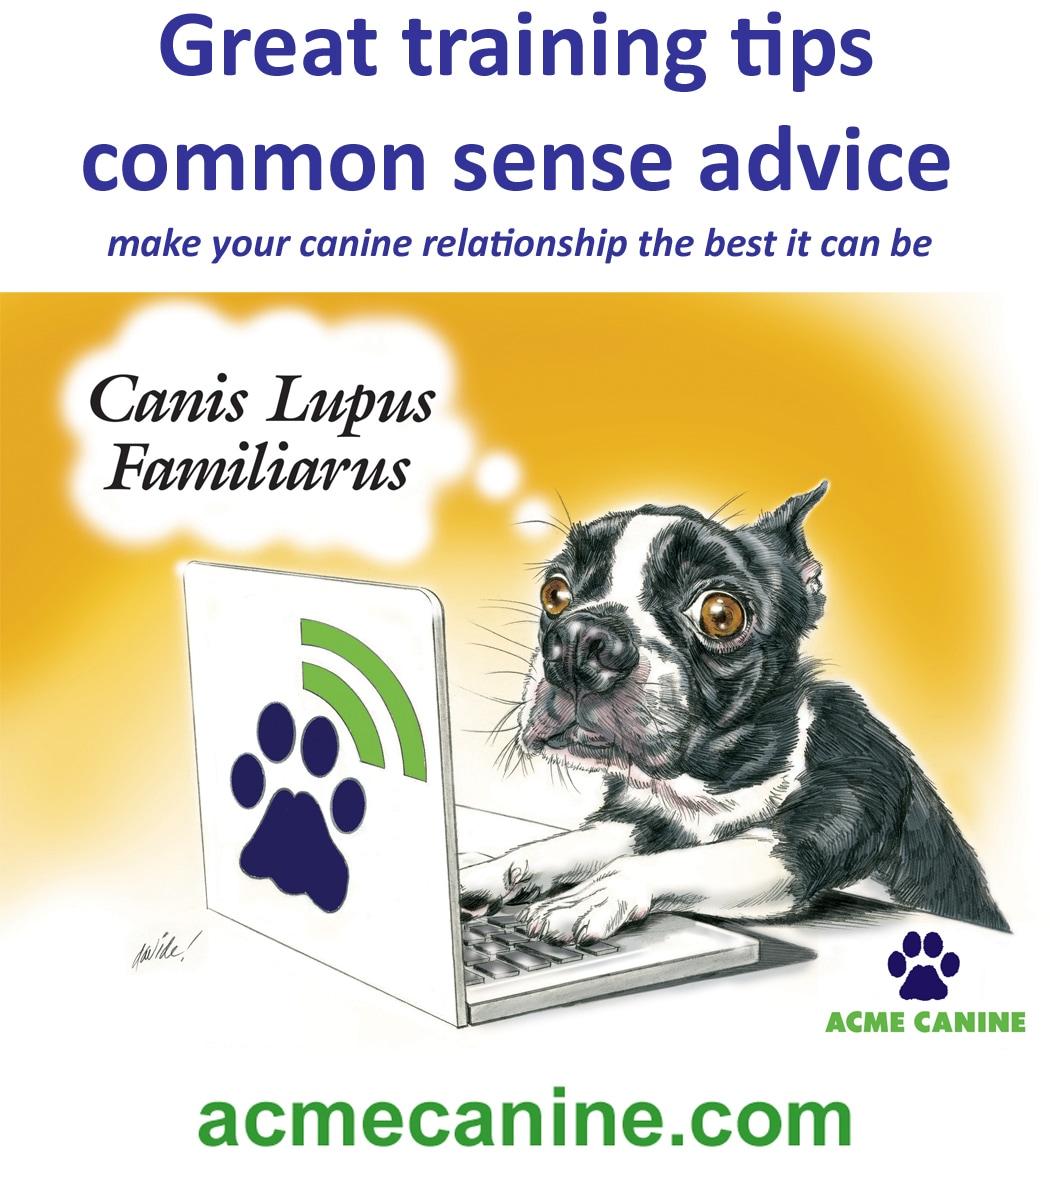 ACME CANINE LLC